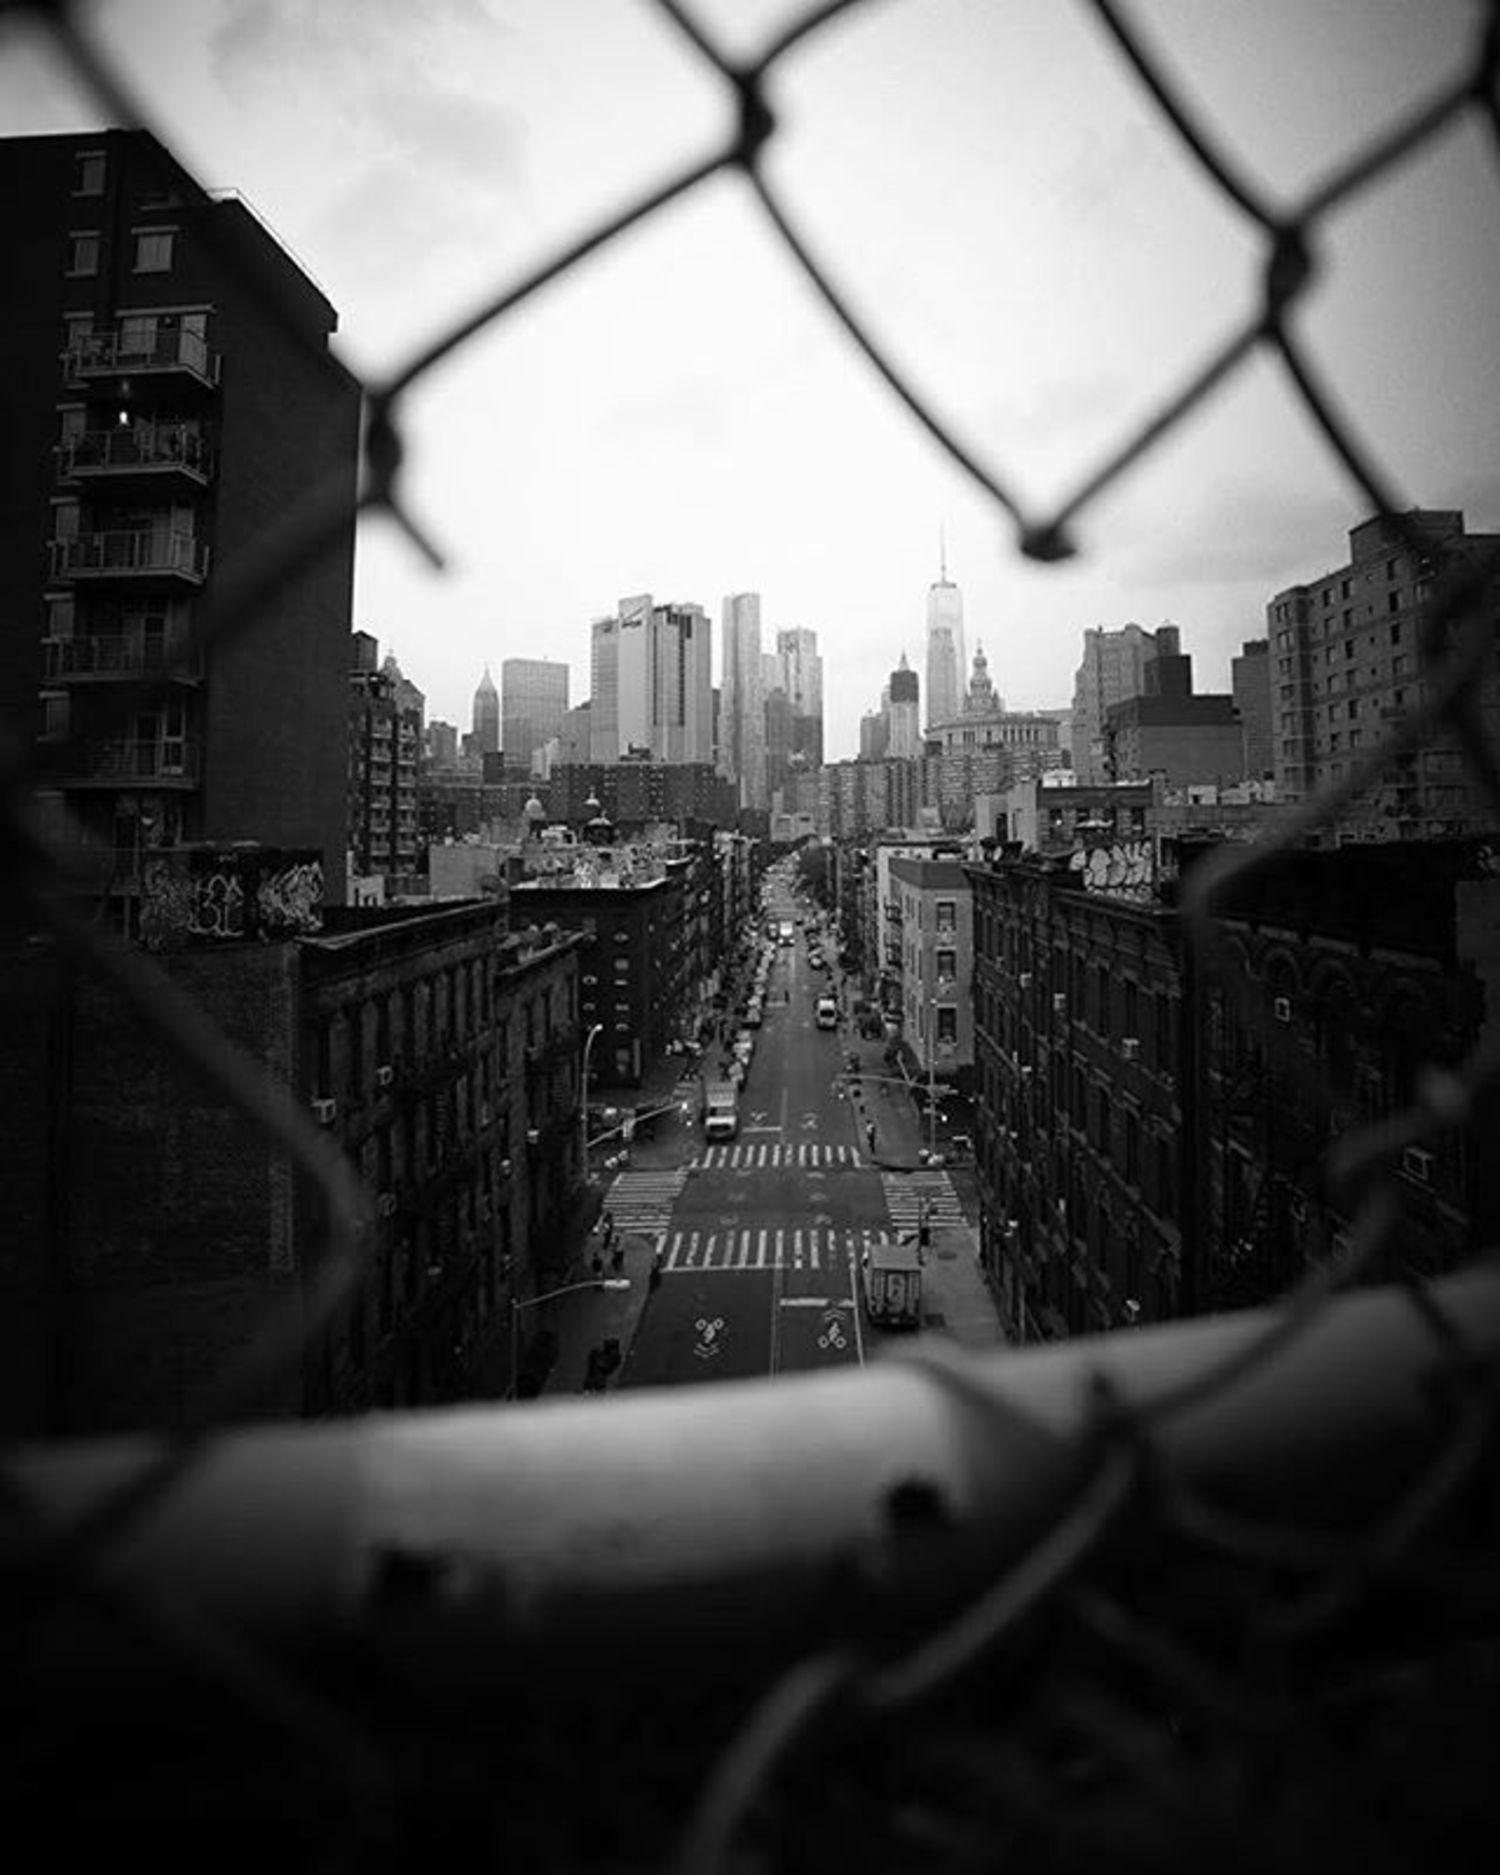 New York, New York. Photo via @raylivez #viewingnyc #newyorkcity #newyork